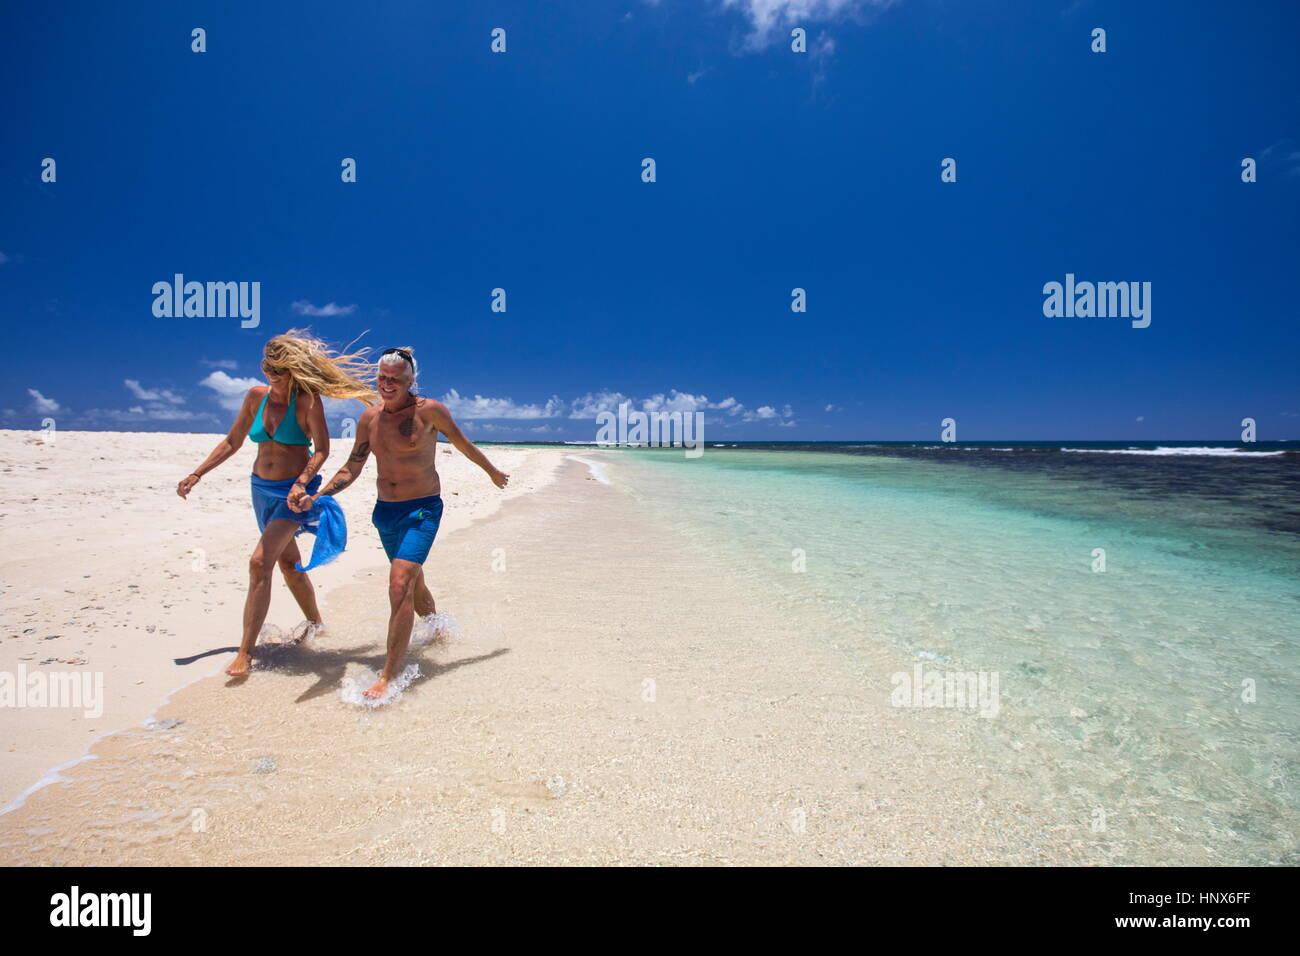 Mature couple walking along beach, holding hands, Ile aux Cerfs, Mauritius - Stock Image